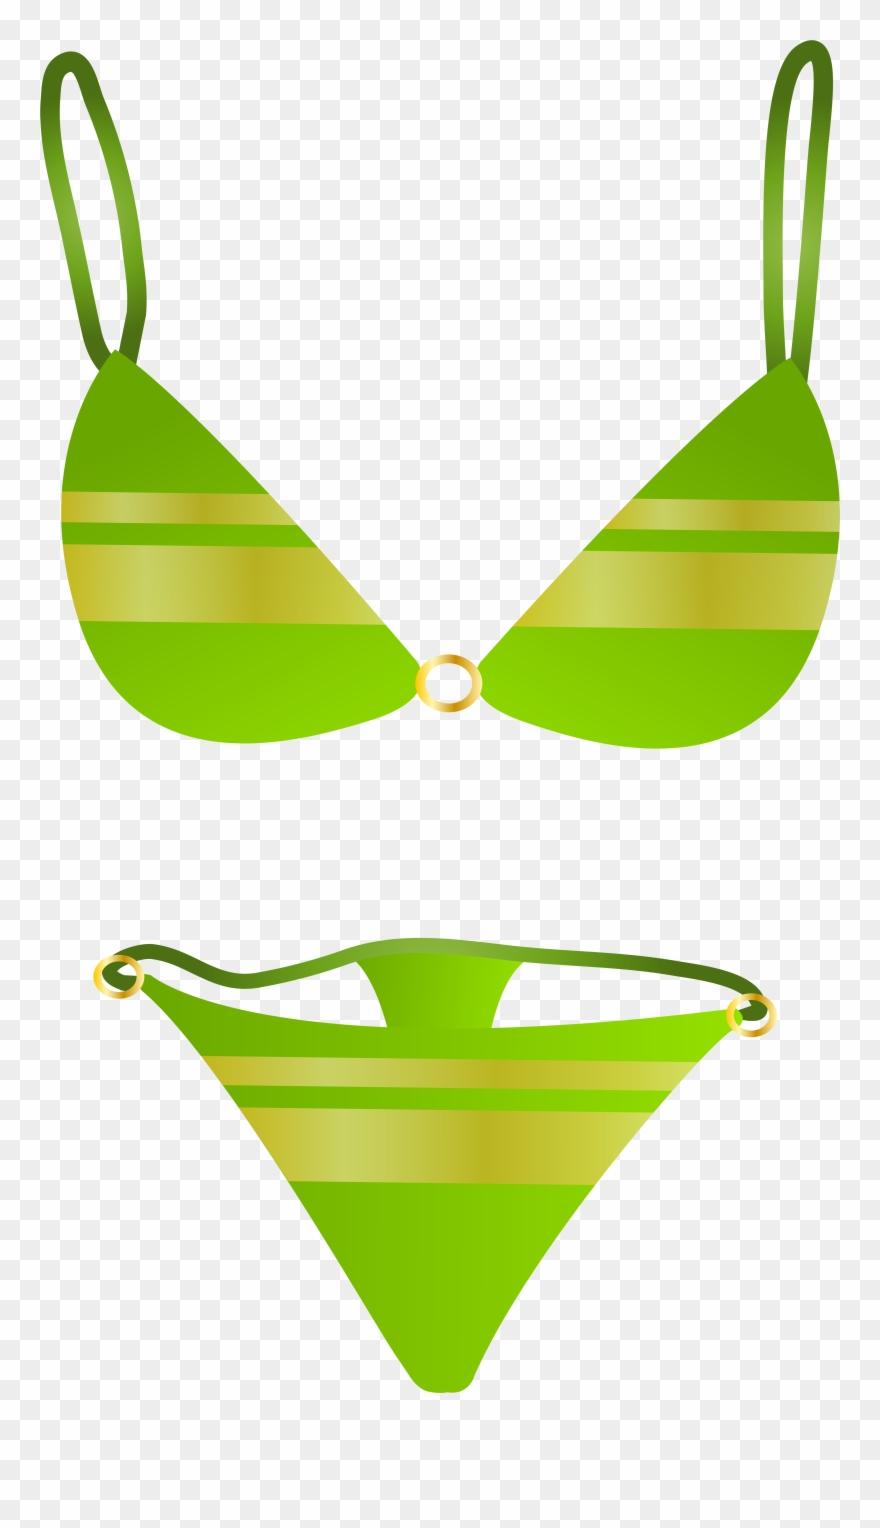 Swimsuit top,Swimsuit bottom,Bikini,Swimwear,Clothing,Green.